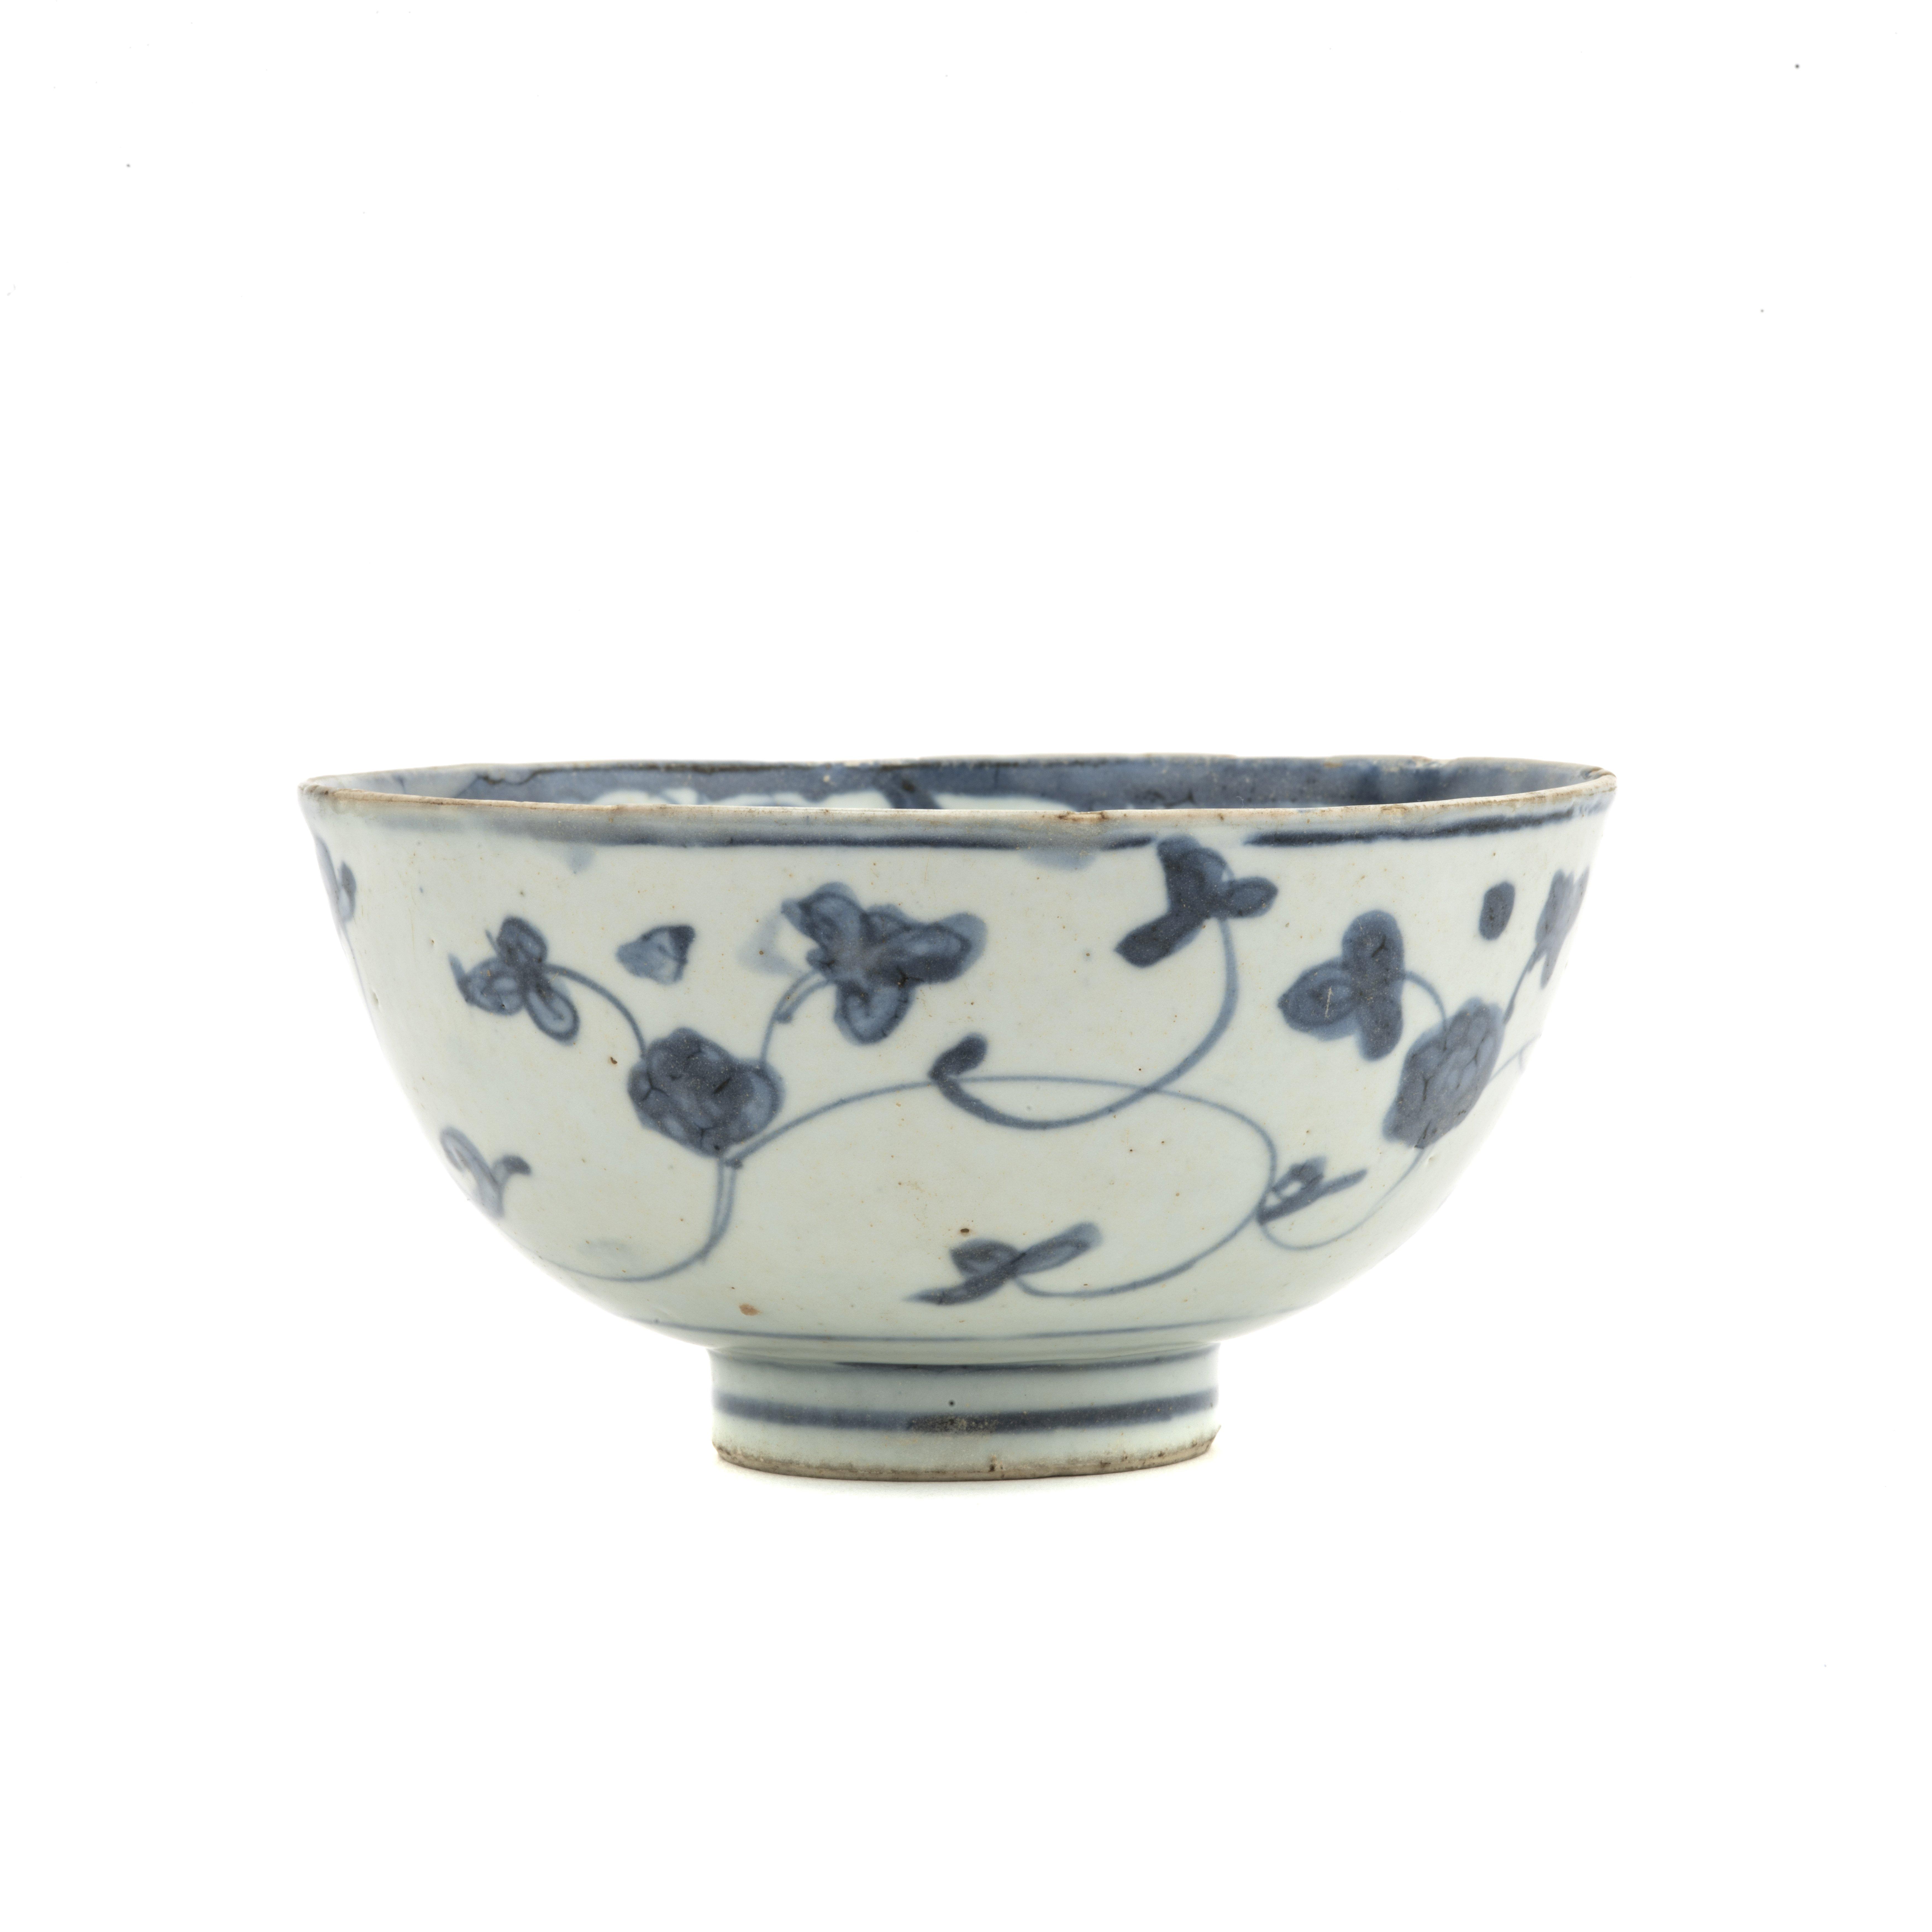 Chinese porcelain blue and white Zhangzhou bowl 4